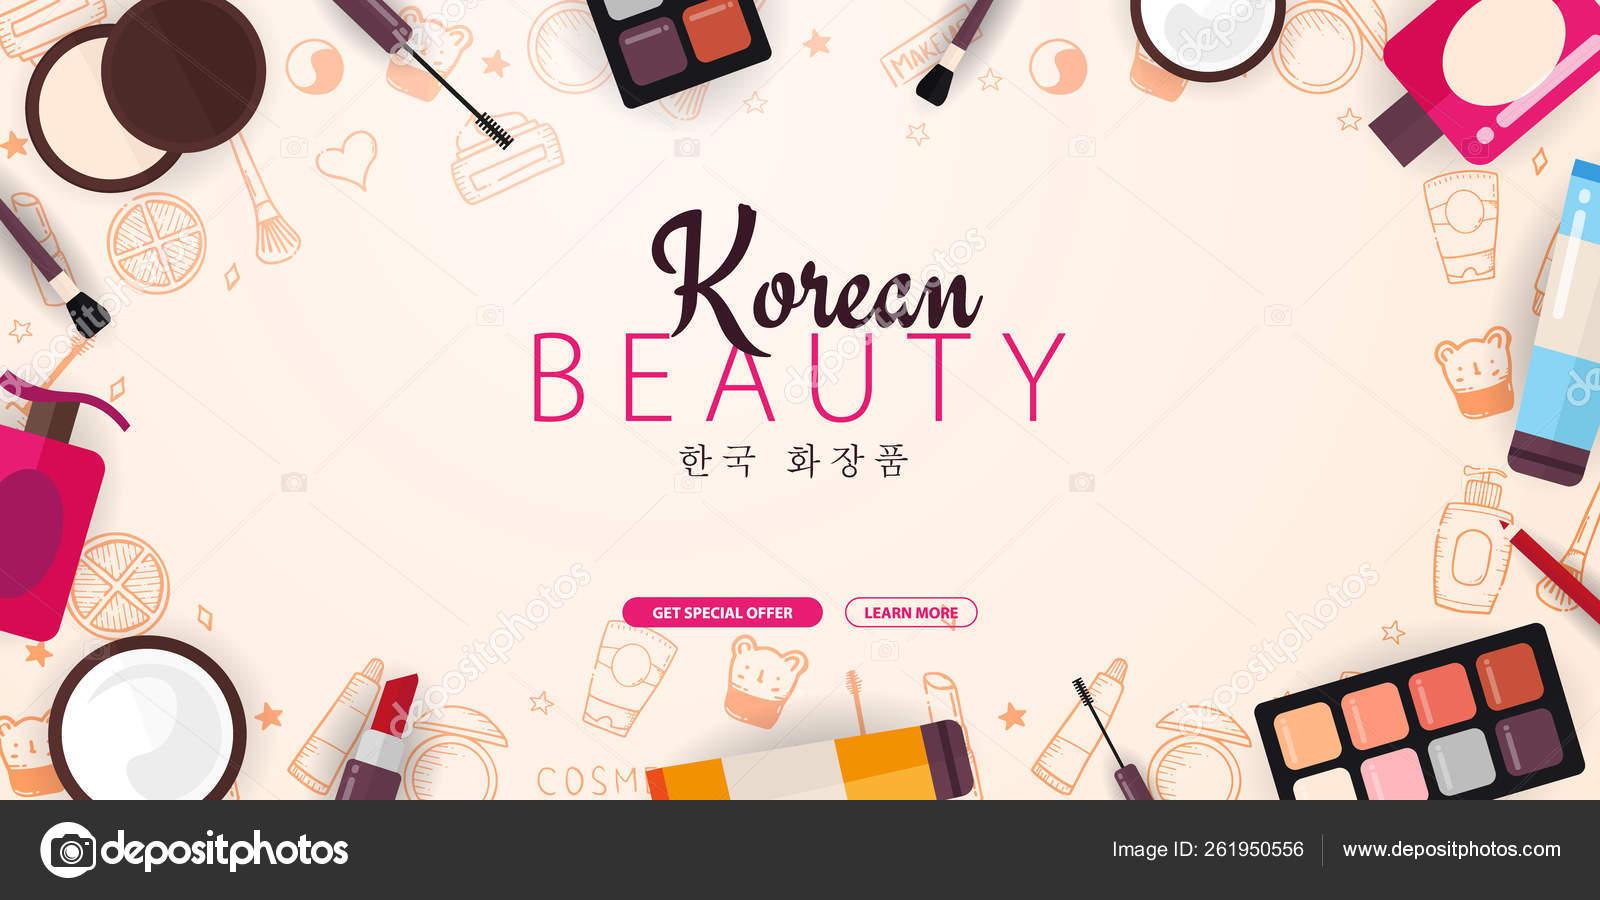 Korean Flat Cosmetics K Beauty Banner With Hand Draw Doodle Background Skincare And Makeup Translation Korean Cosmetics Vector Illustration Stock Vector C Leo Design 261950556